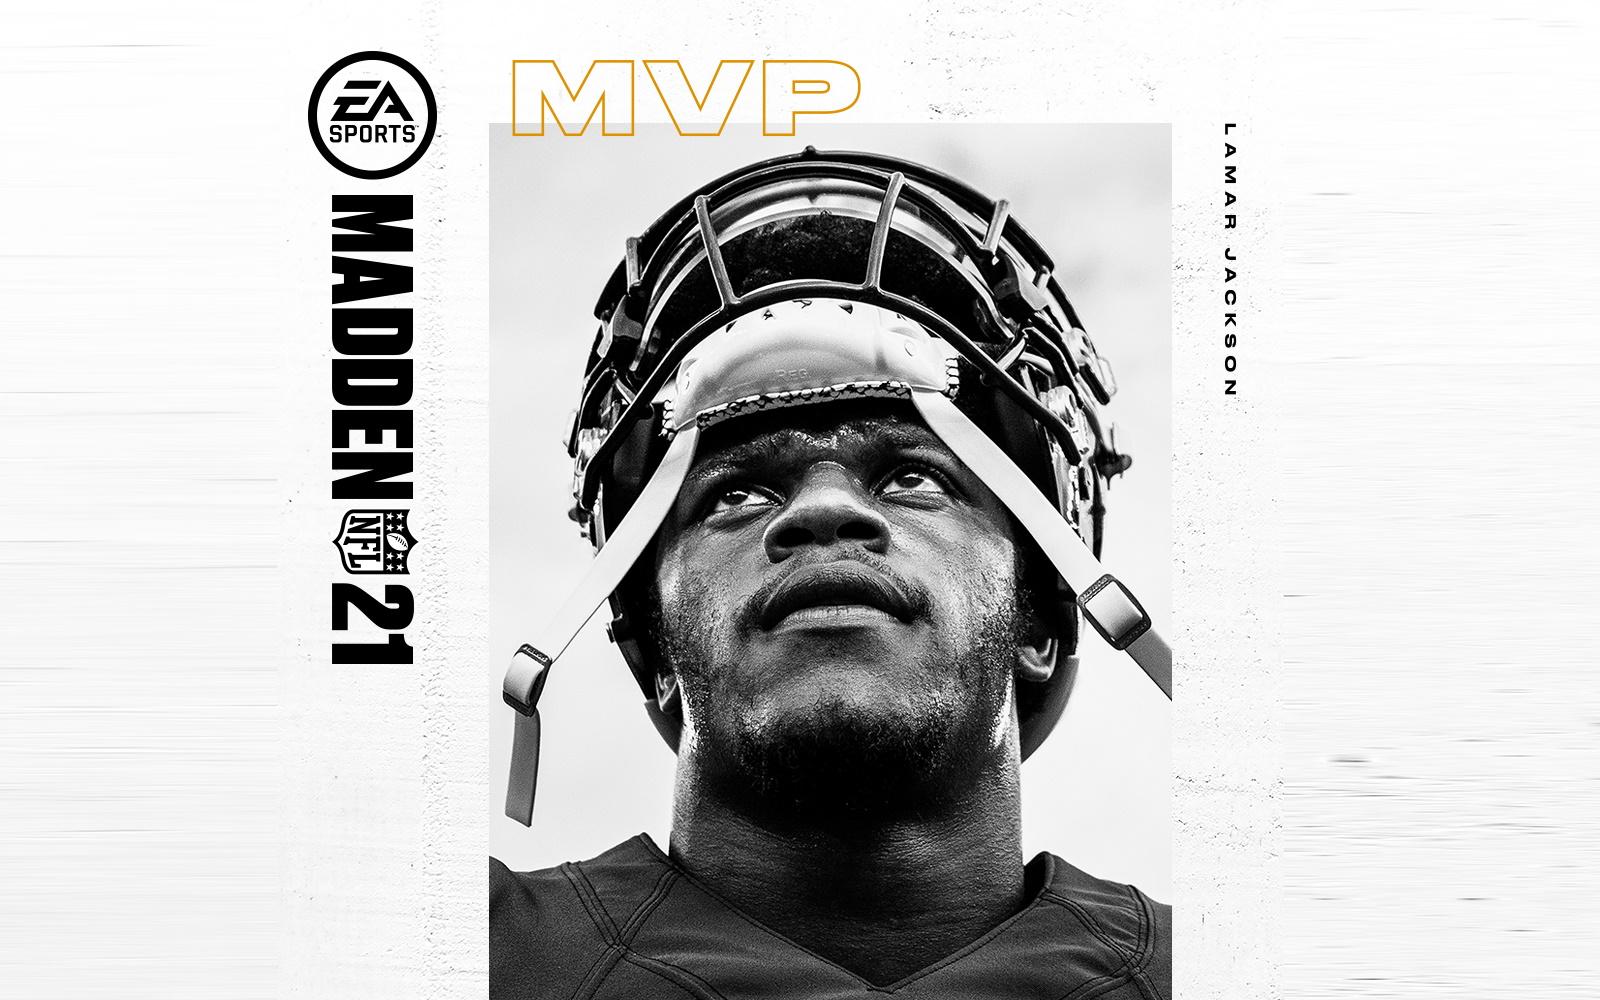 NFL 21 Cover Star & Current-Gen Trailer Revealed By EA